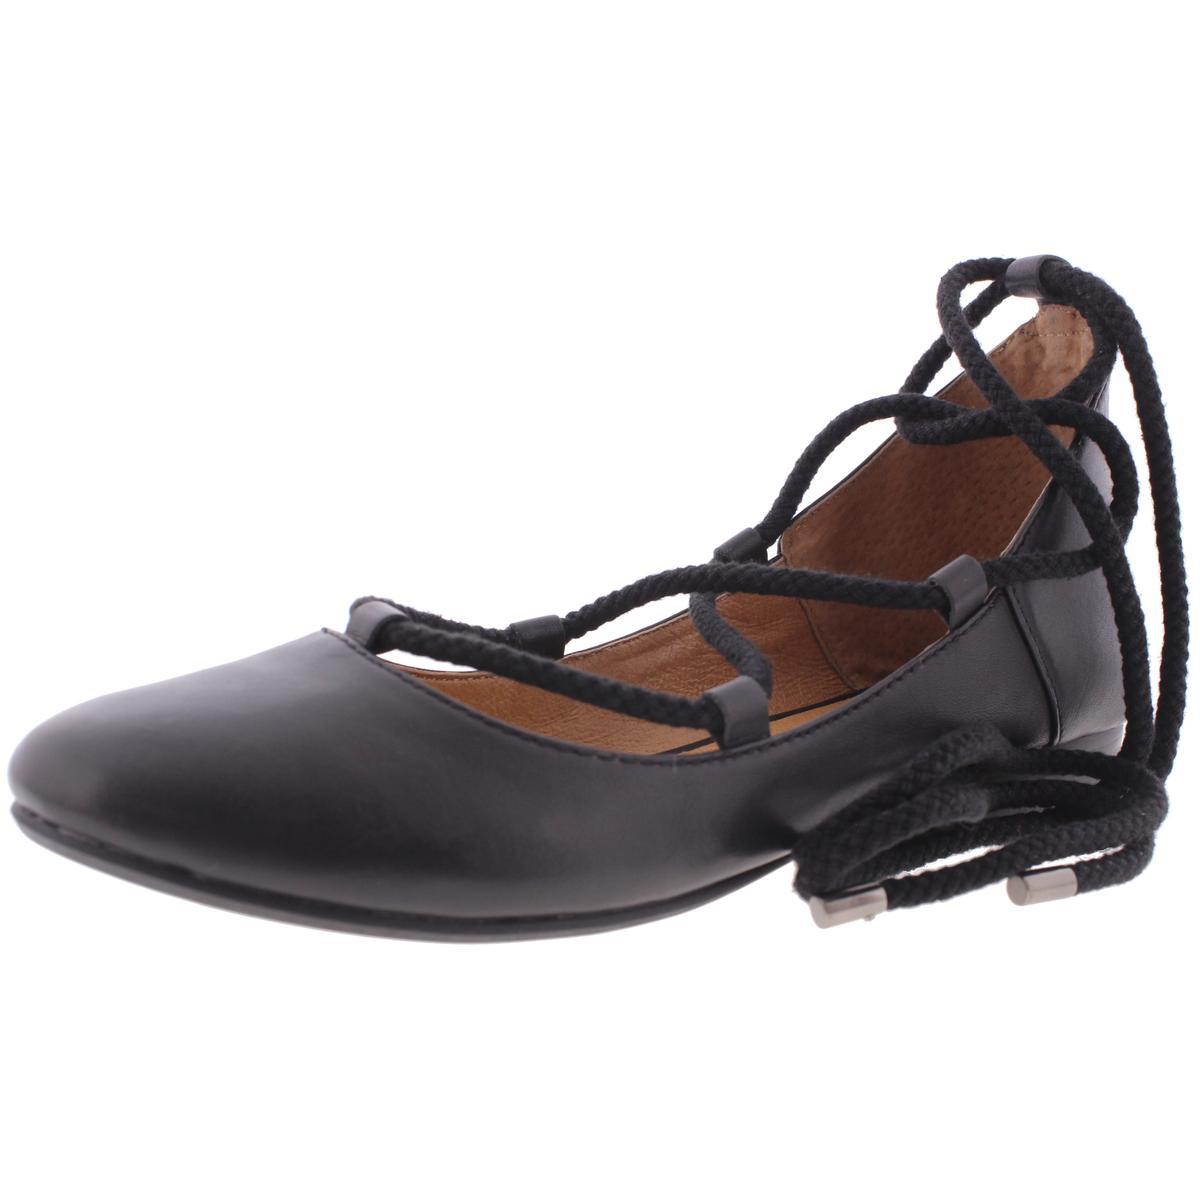 Kelsi Dagger Brooklyn Womens Ballet Deandra Leather Round Toe Ballet Womens Flats e50c28